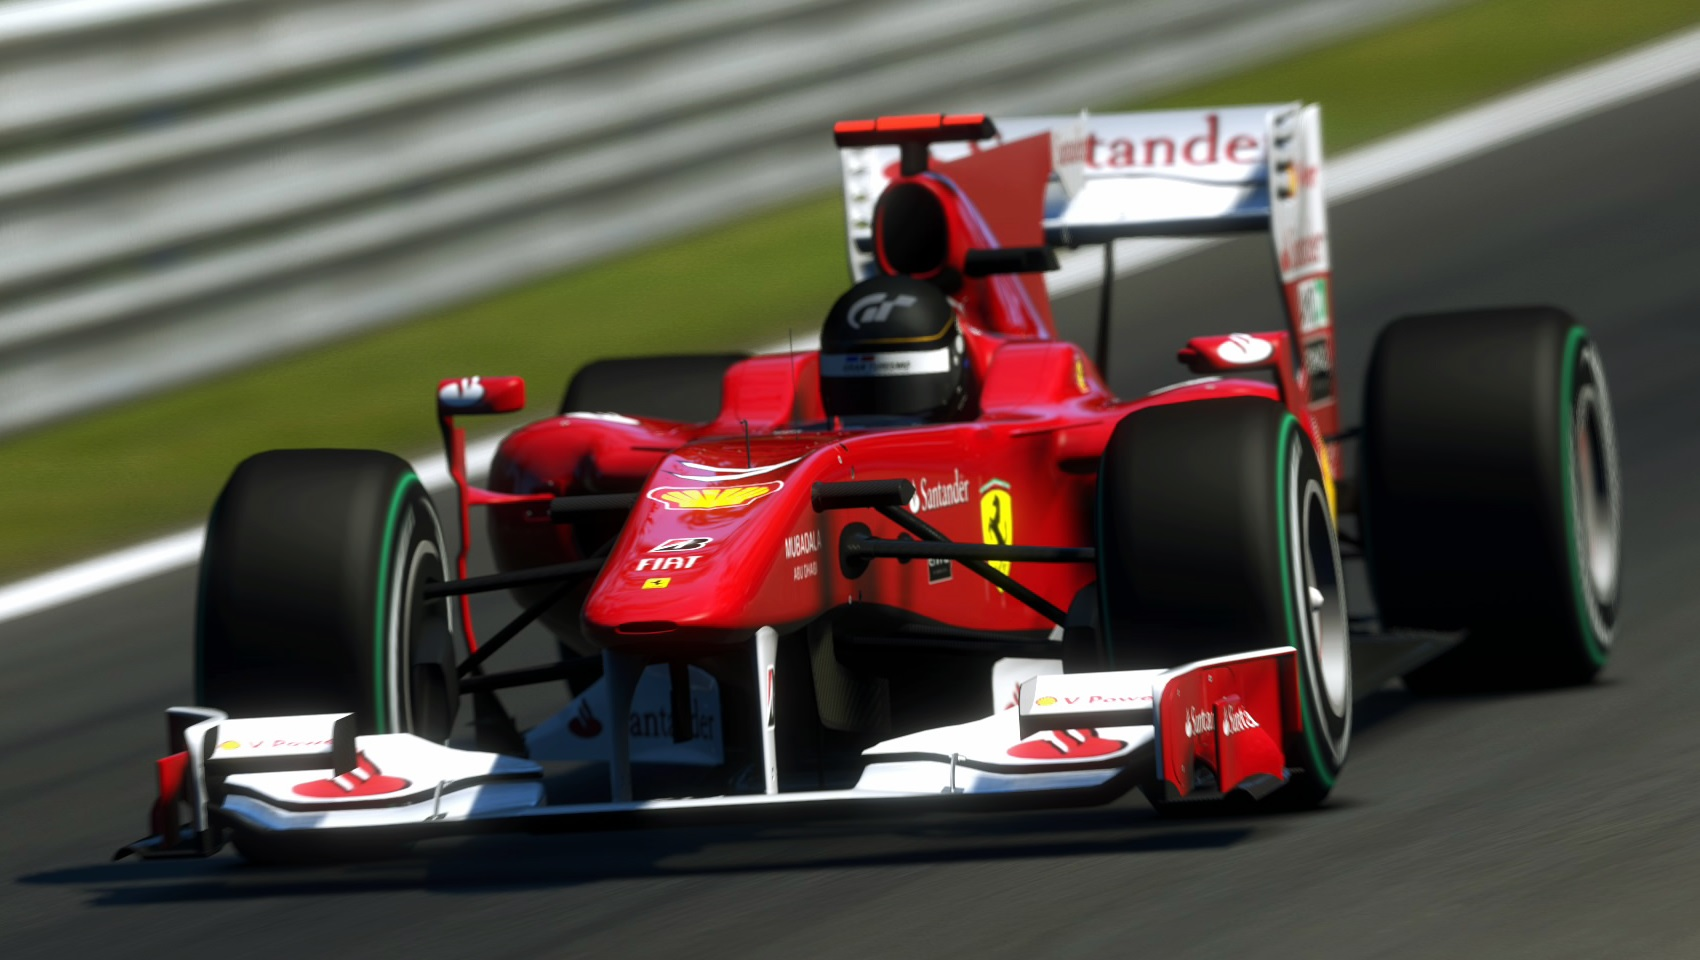 Ferrari F10 | Gran Turismo Wiki | FANDOM powered by Wikia